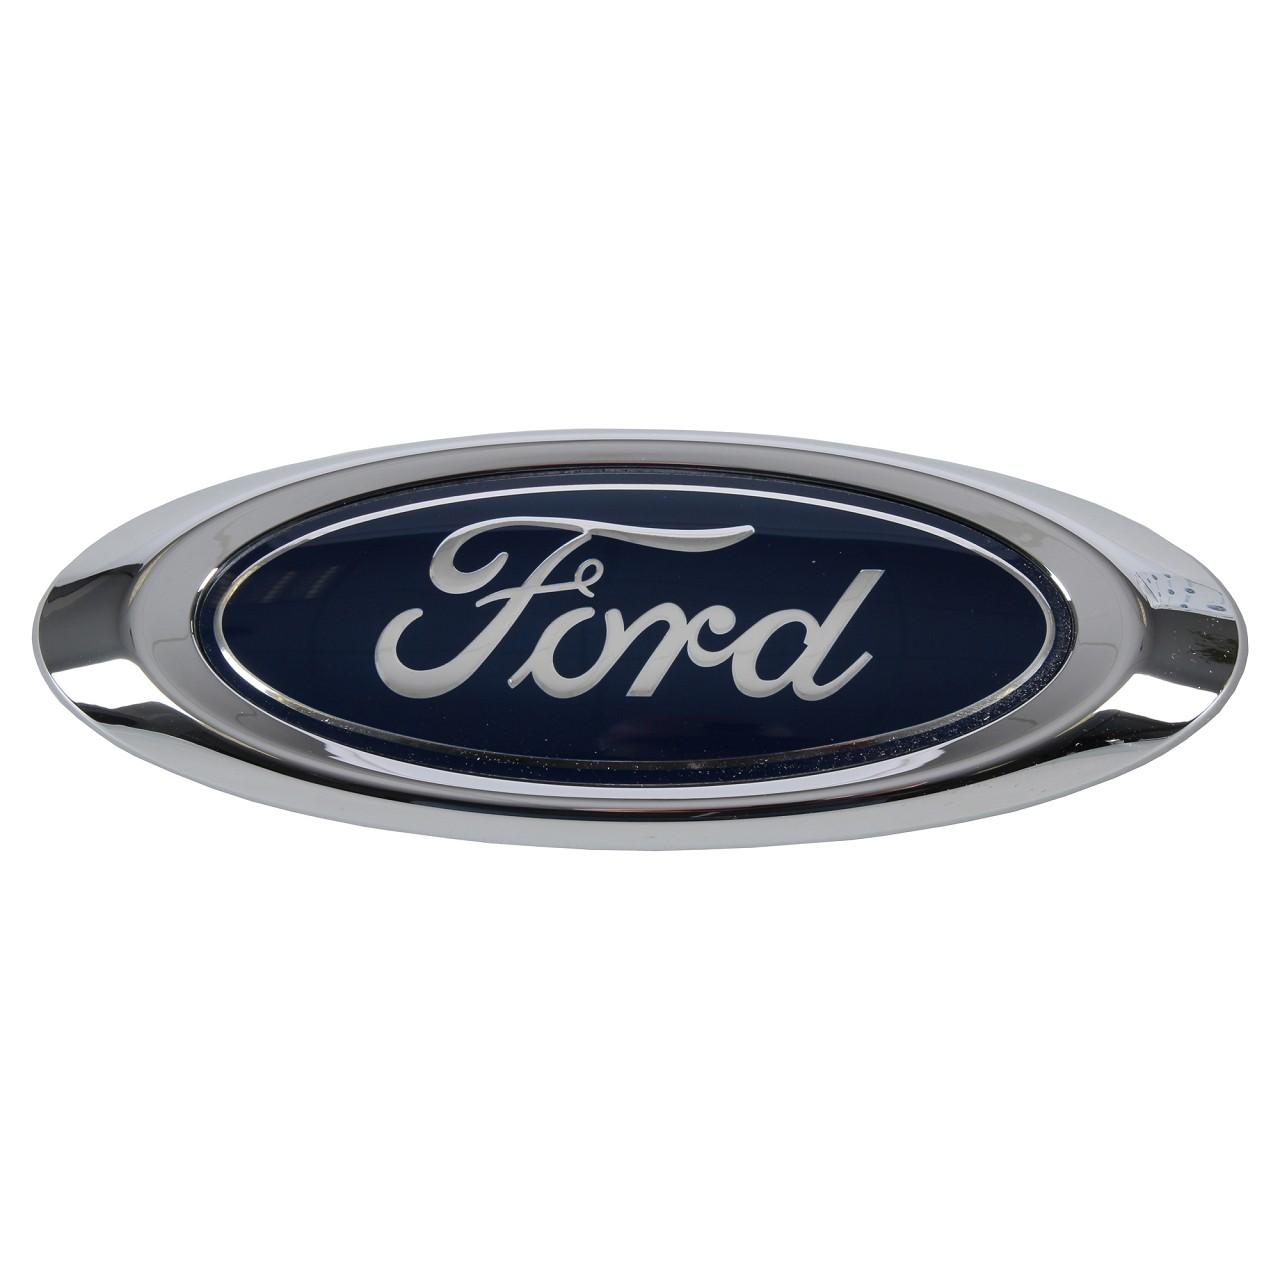 ORIGINAL Ford Emblem Schriftzug Oval S-Max Galaxy WA6 Mondeo IV VORNE 1780435